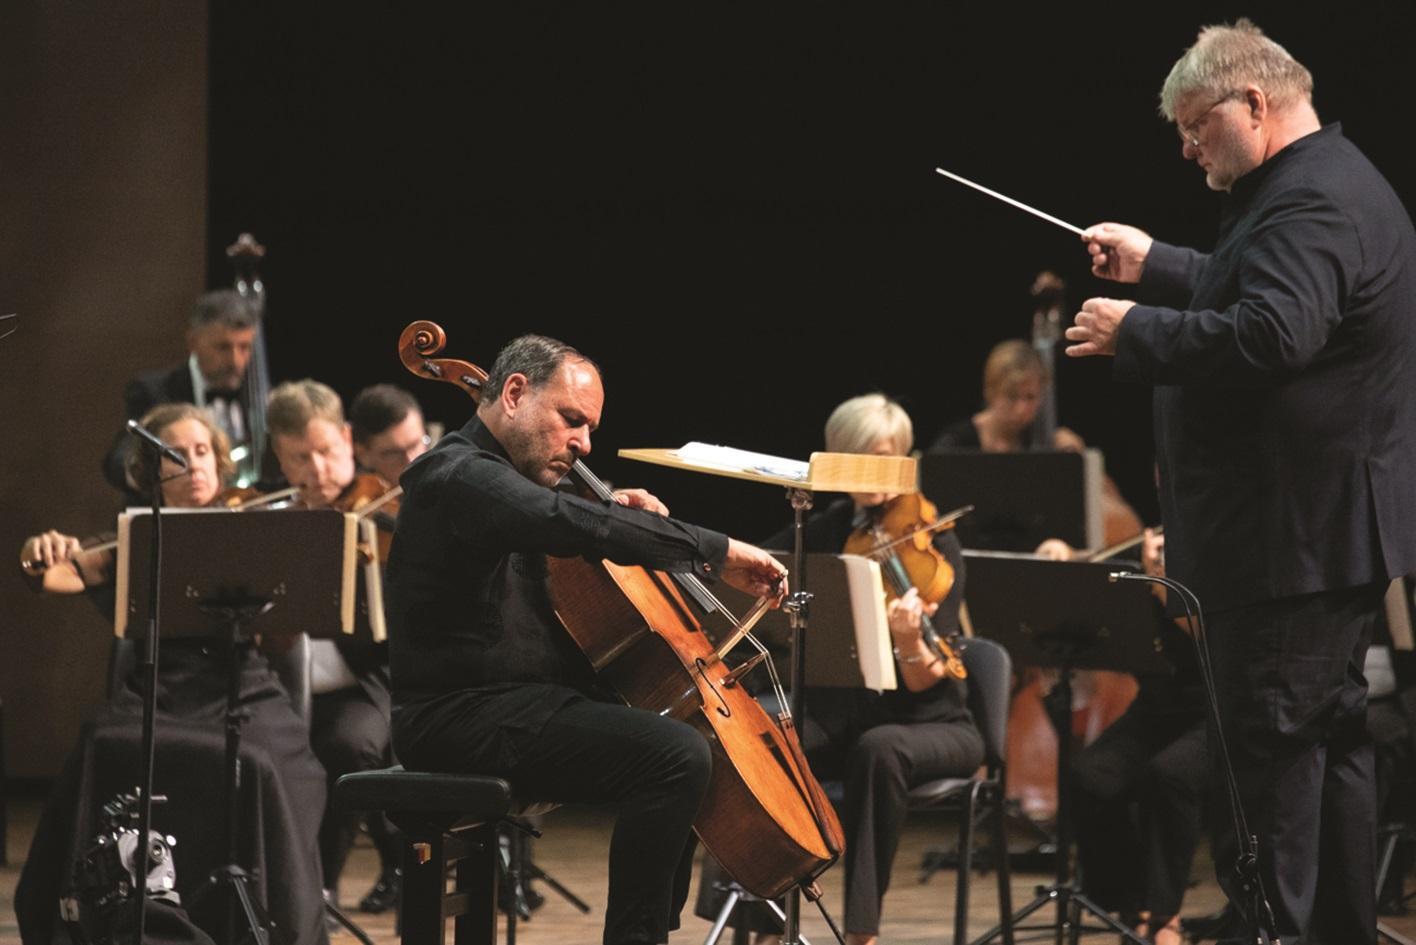 Cellist Gary Hoffman being led by the conductor Dmitry Yablonsky. Photo: Evgeny Evtyukhov